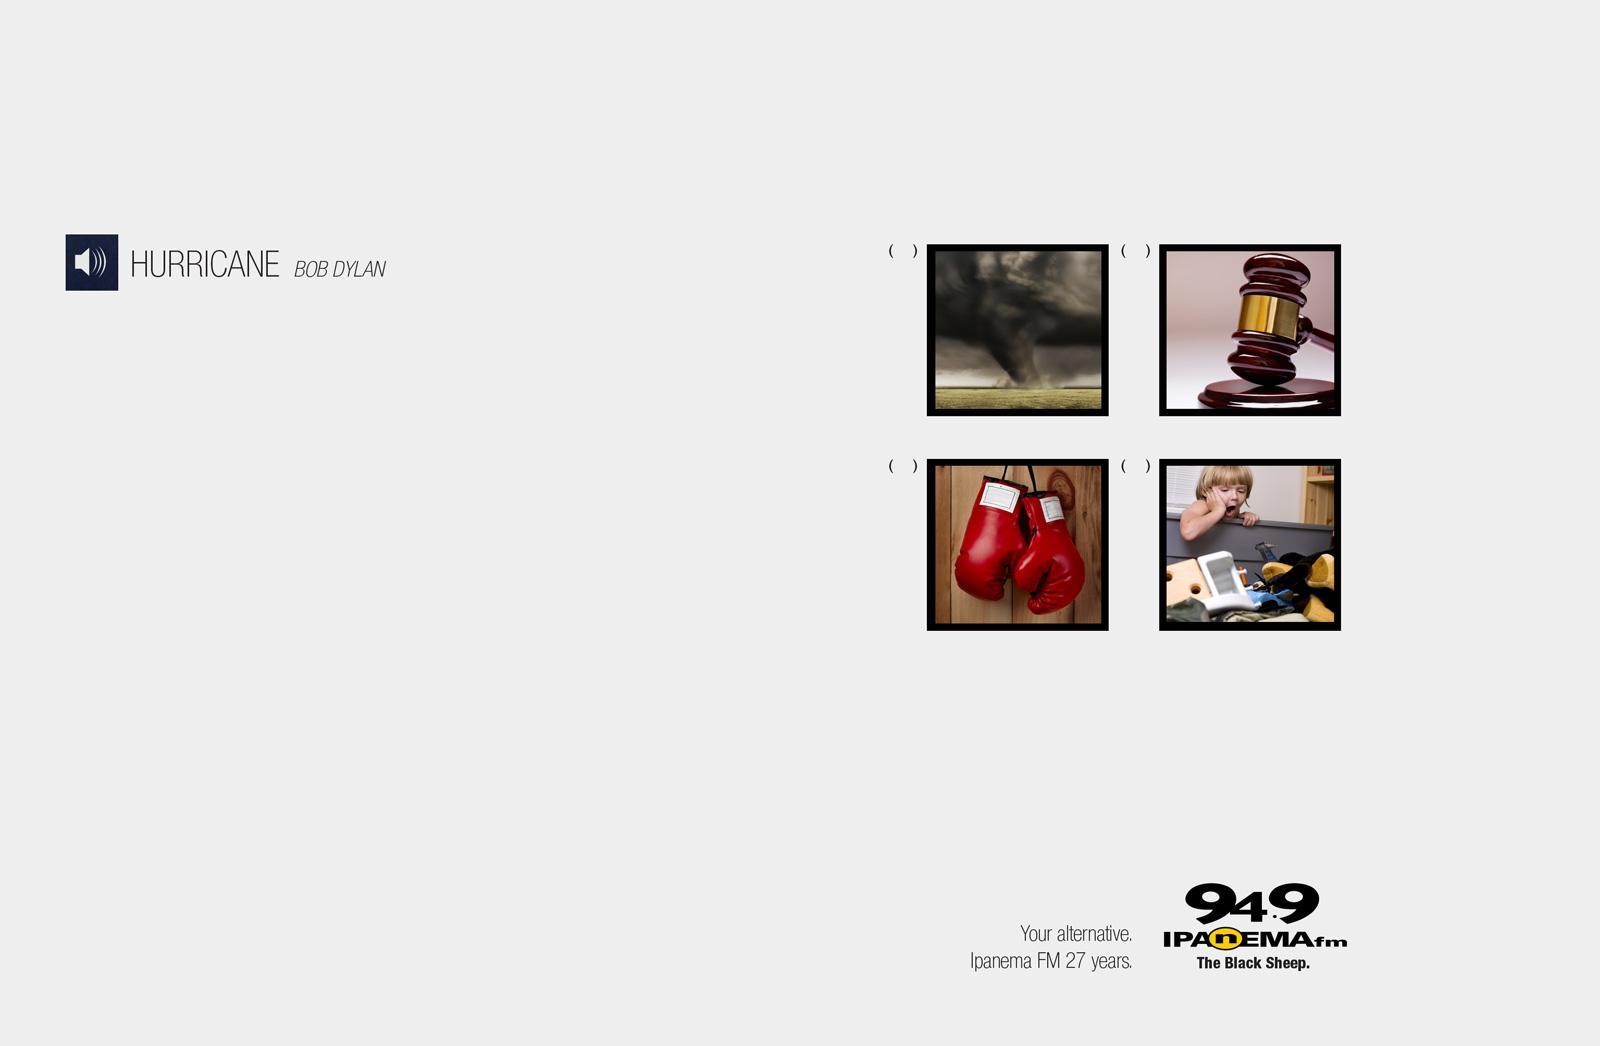 Ipanema FM Print Ad -  Your alternative, Hurricane